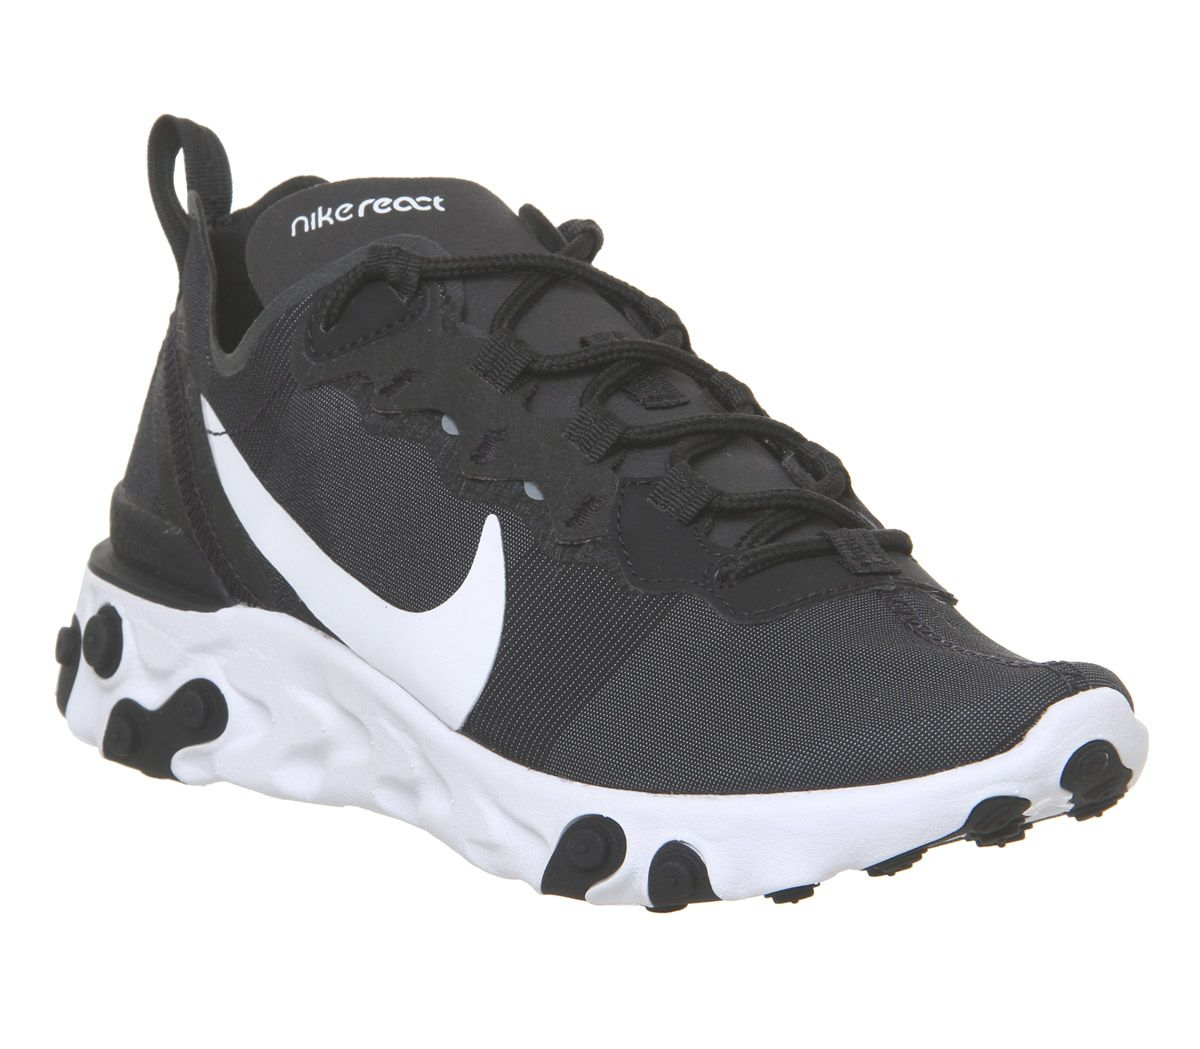 2f93e5c5a1e72 Nike React Element 55 Trainers Black White F - Hers trainers